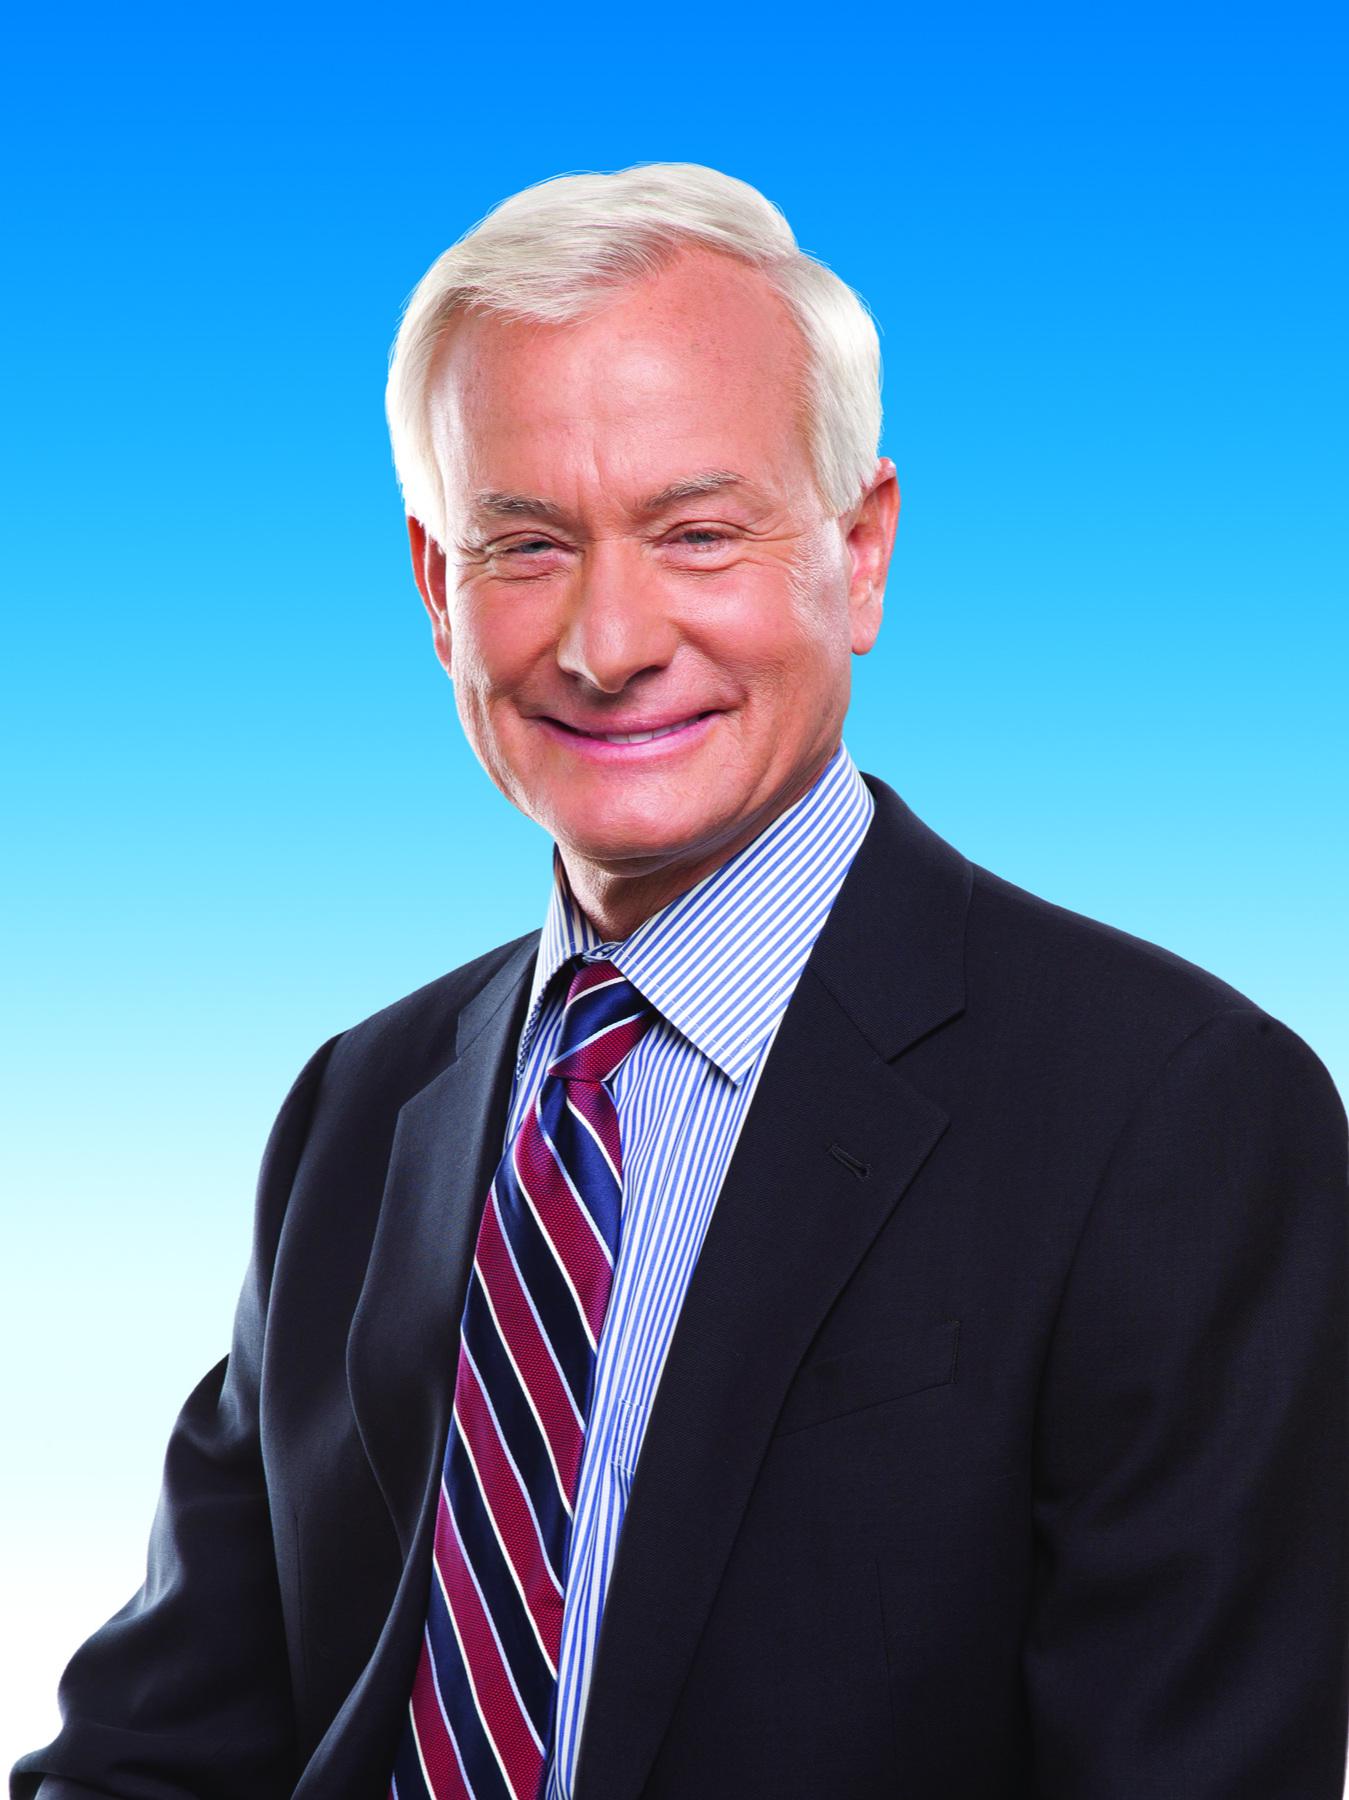 Mayor Kirk Caldwell Photo